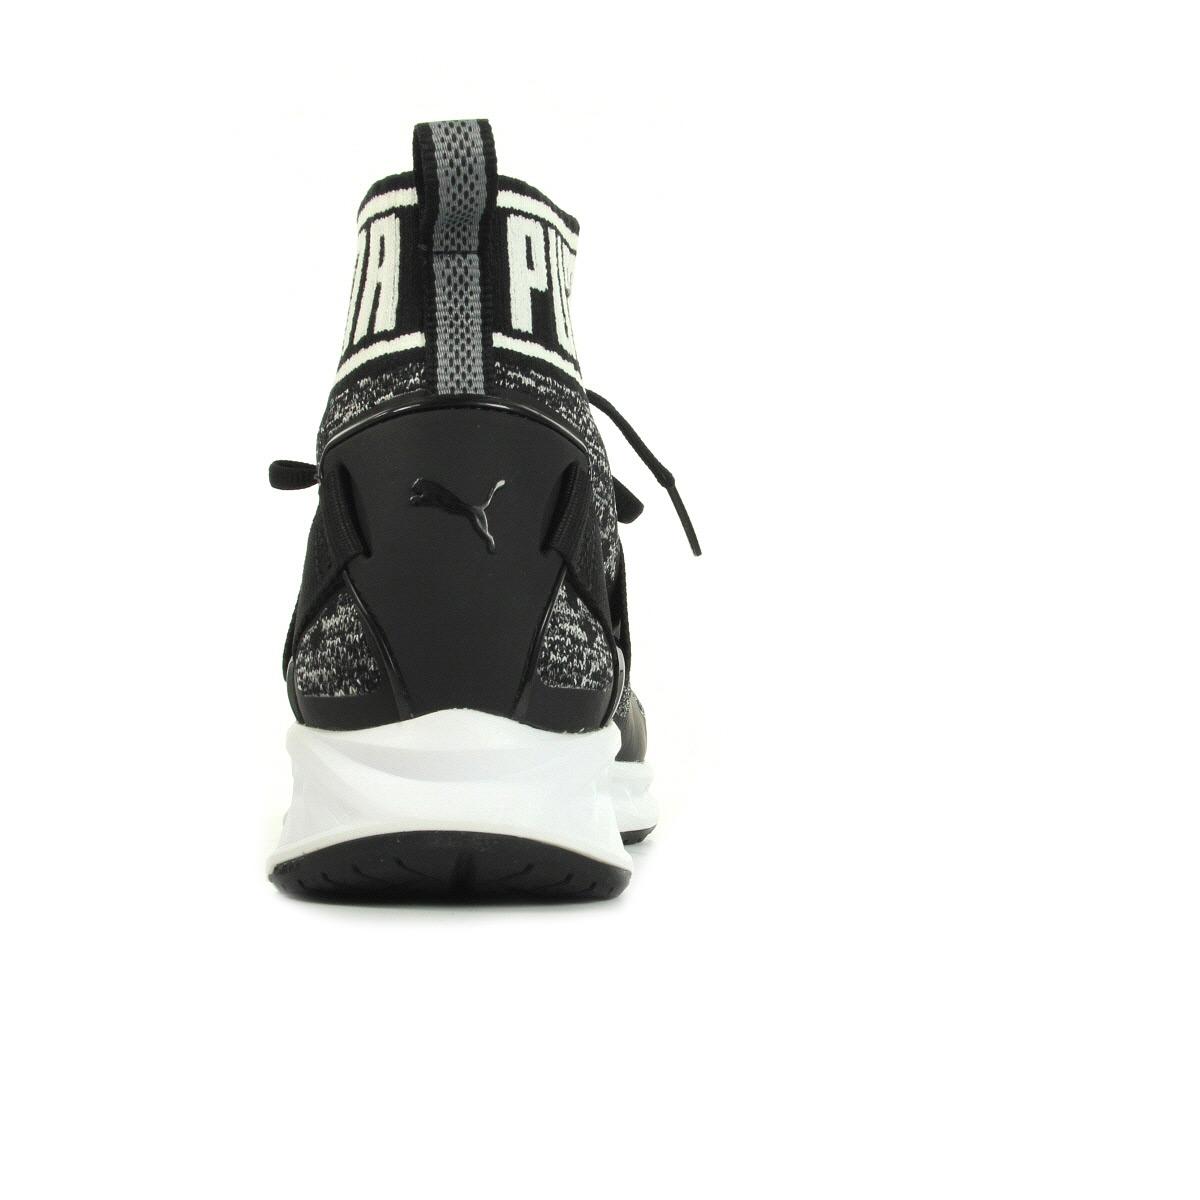 Puma Ignite EvoKnit 18969701, Baskets mode homme